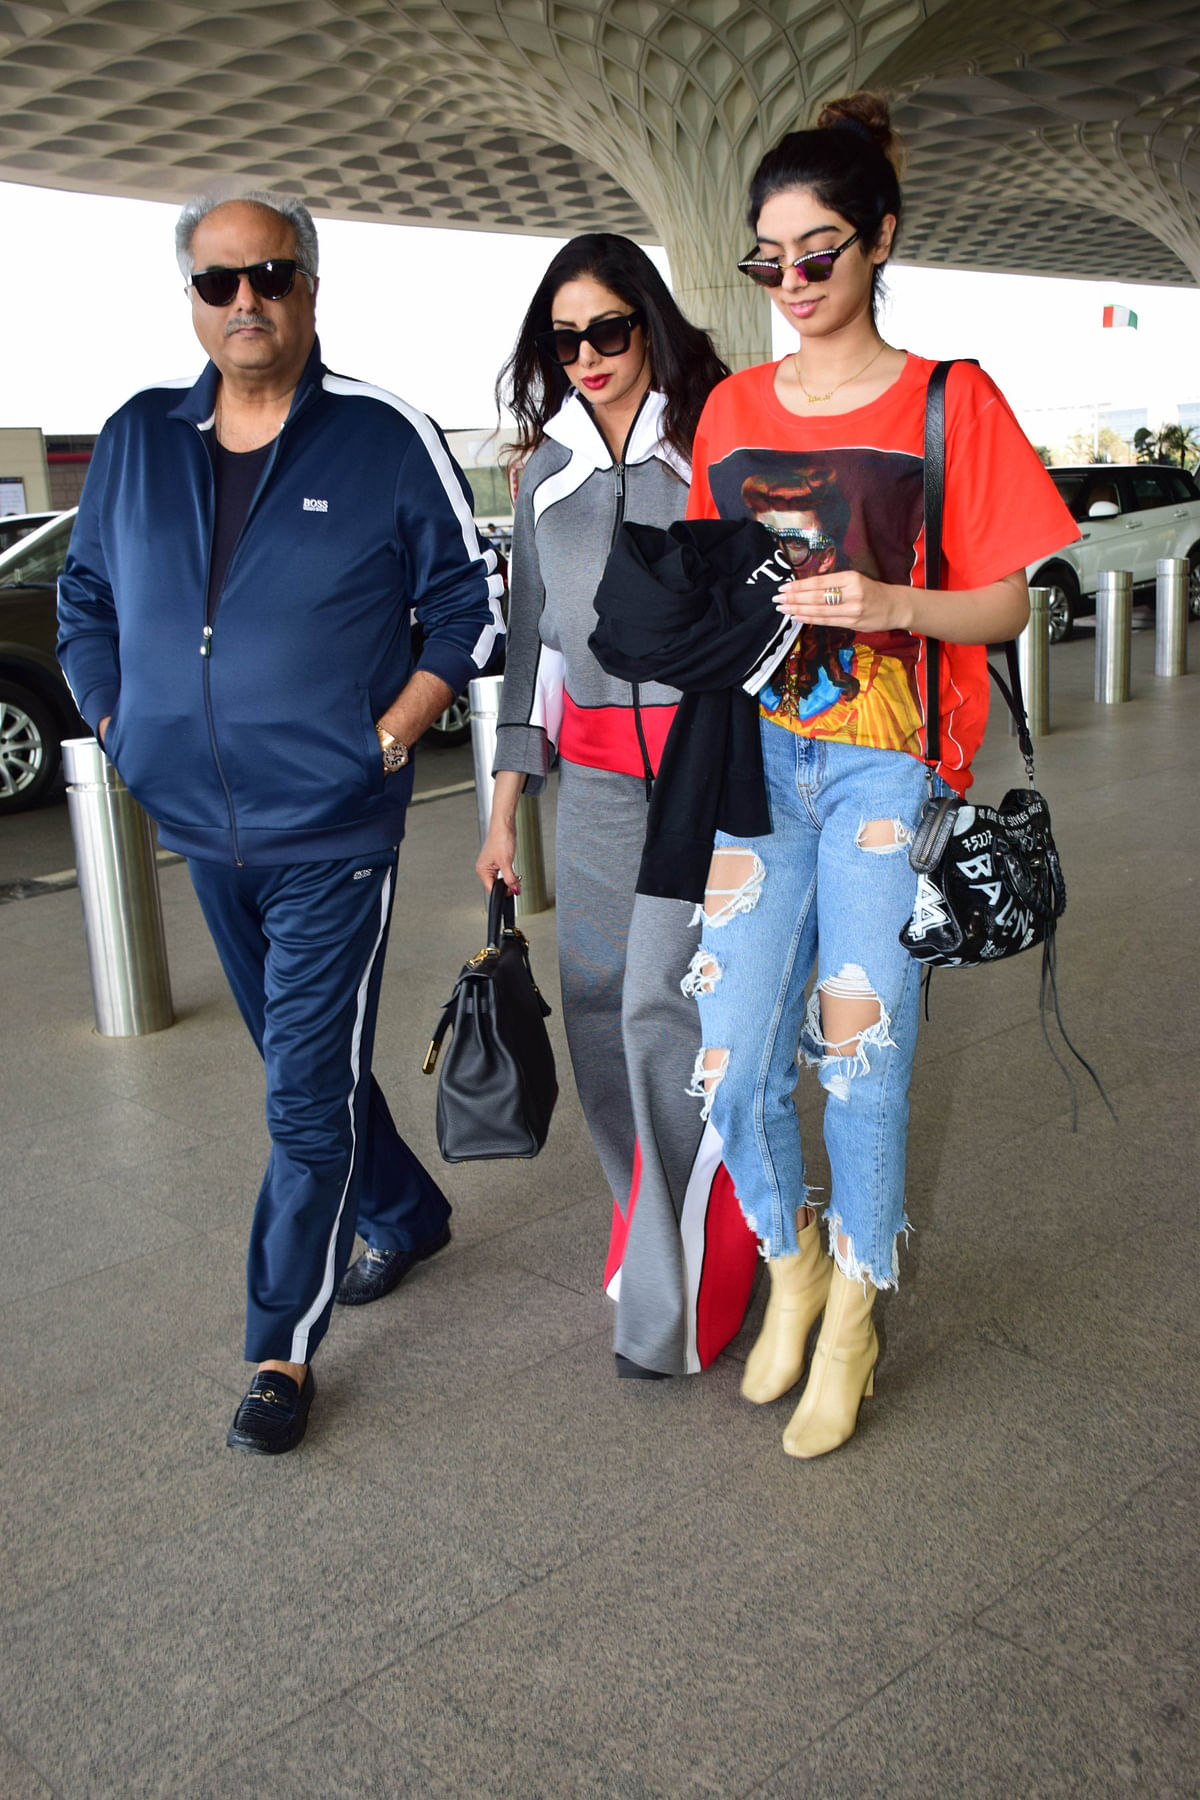 Boney Kapoor, Sridevi and daughter Khushi at the Mumbai airport while leaving for Mohit Marwah's wedding.